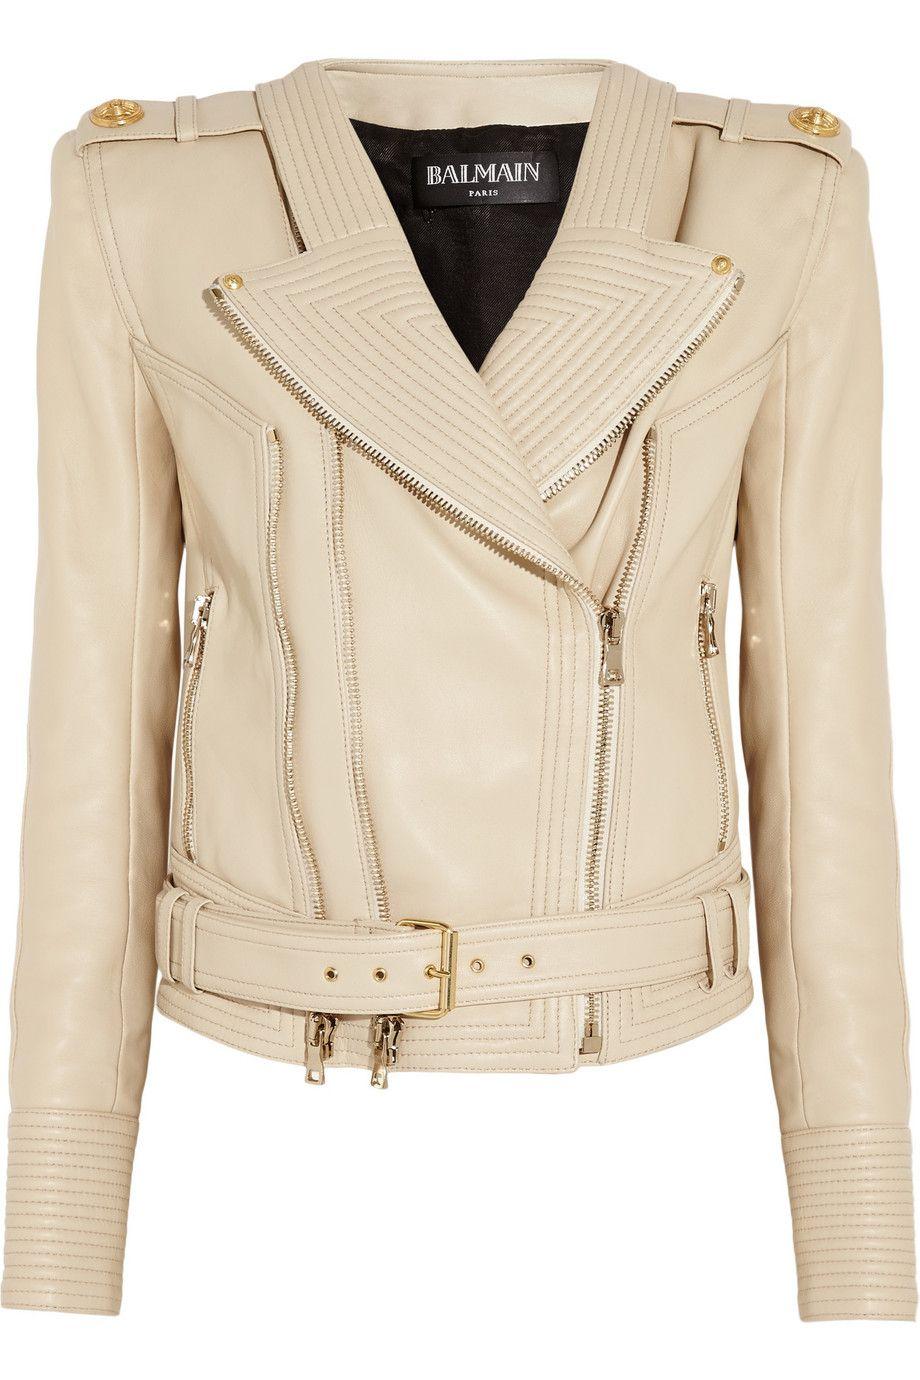 Balmain Balmain Leather Jacket Ribbed Leather Jacket Leather Jackets Women [ 1380 x 920 Pixel ]